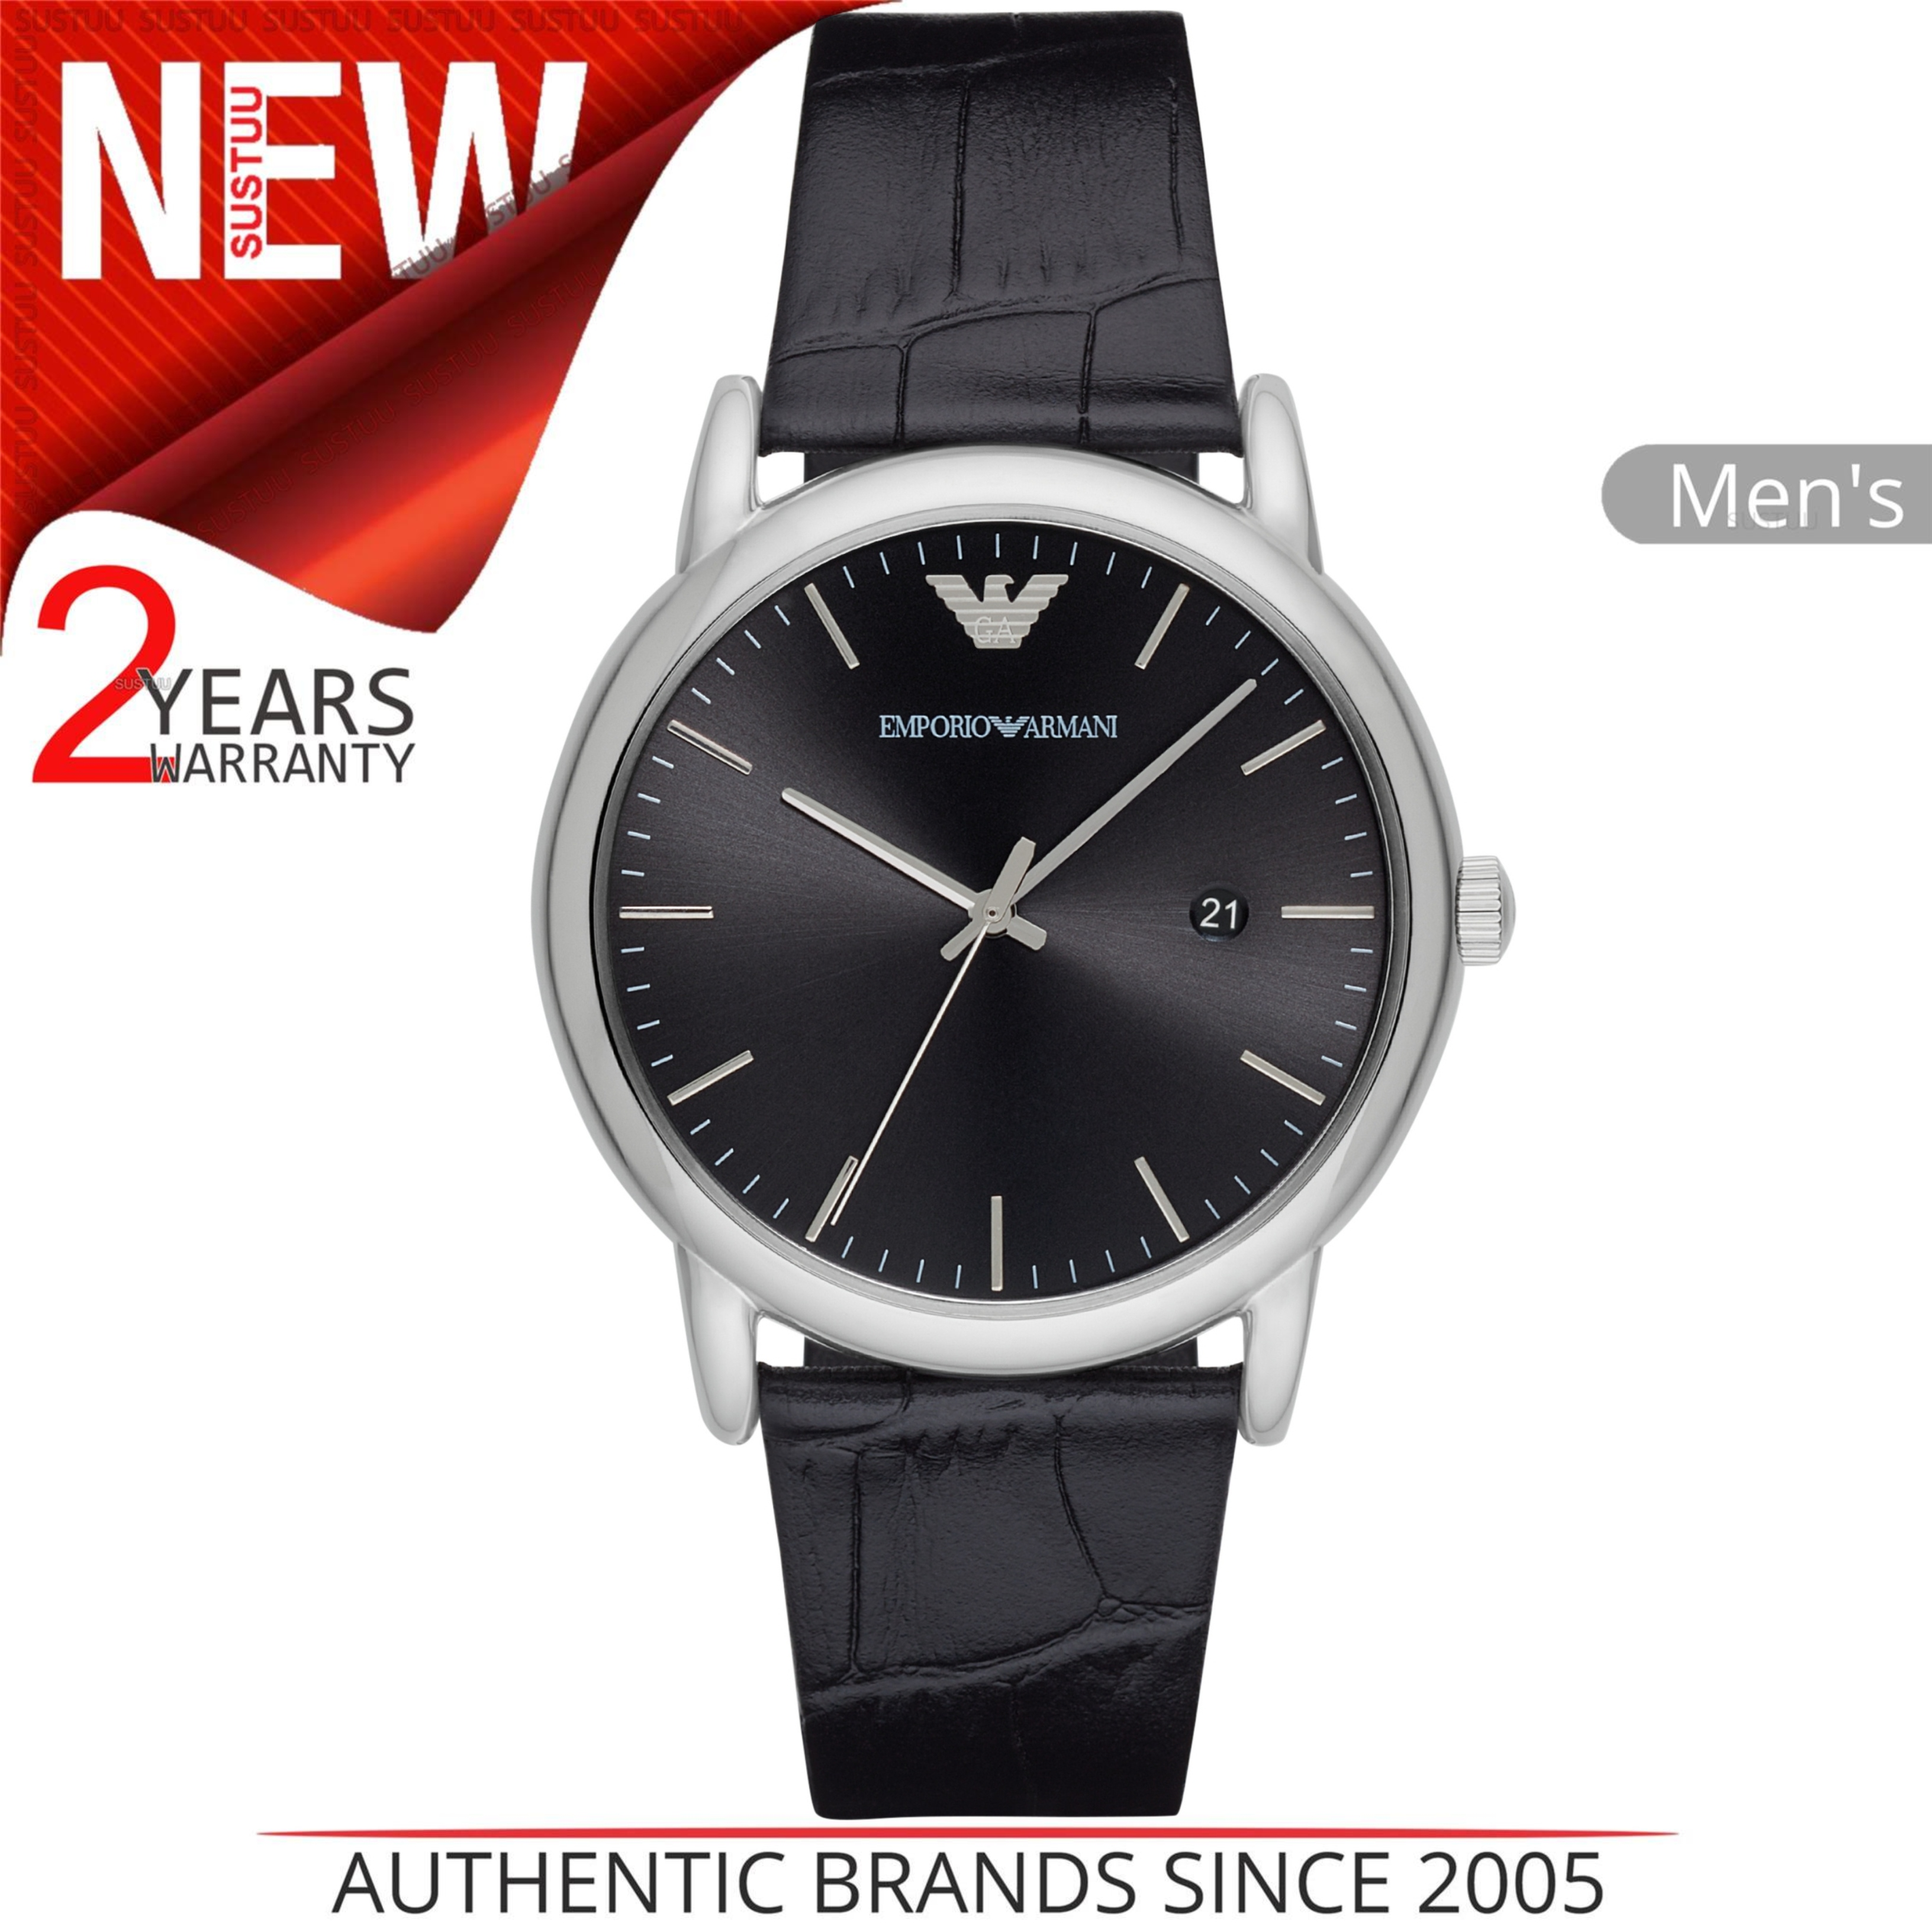 9f5487e5be55 CENTINELA Emporio Armani Luigi - Reloj de vestir para hombre AR2500 Case  Estuche de plata con esfera